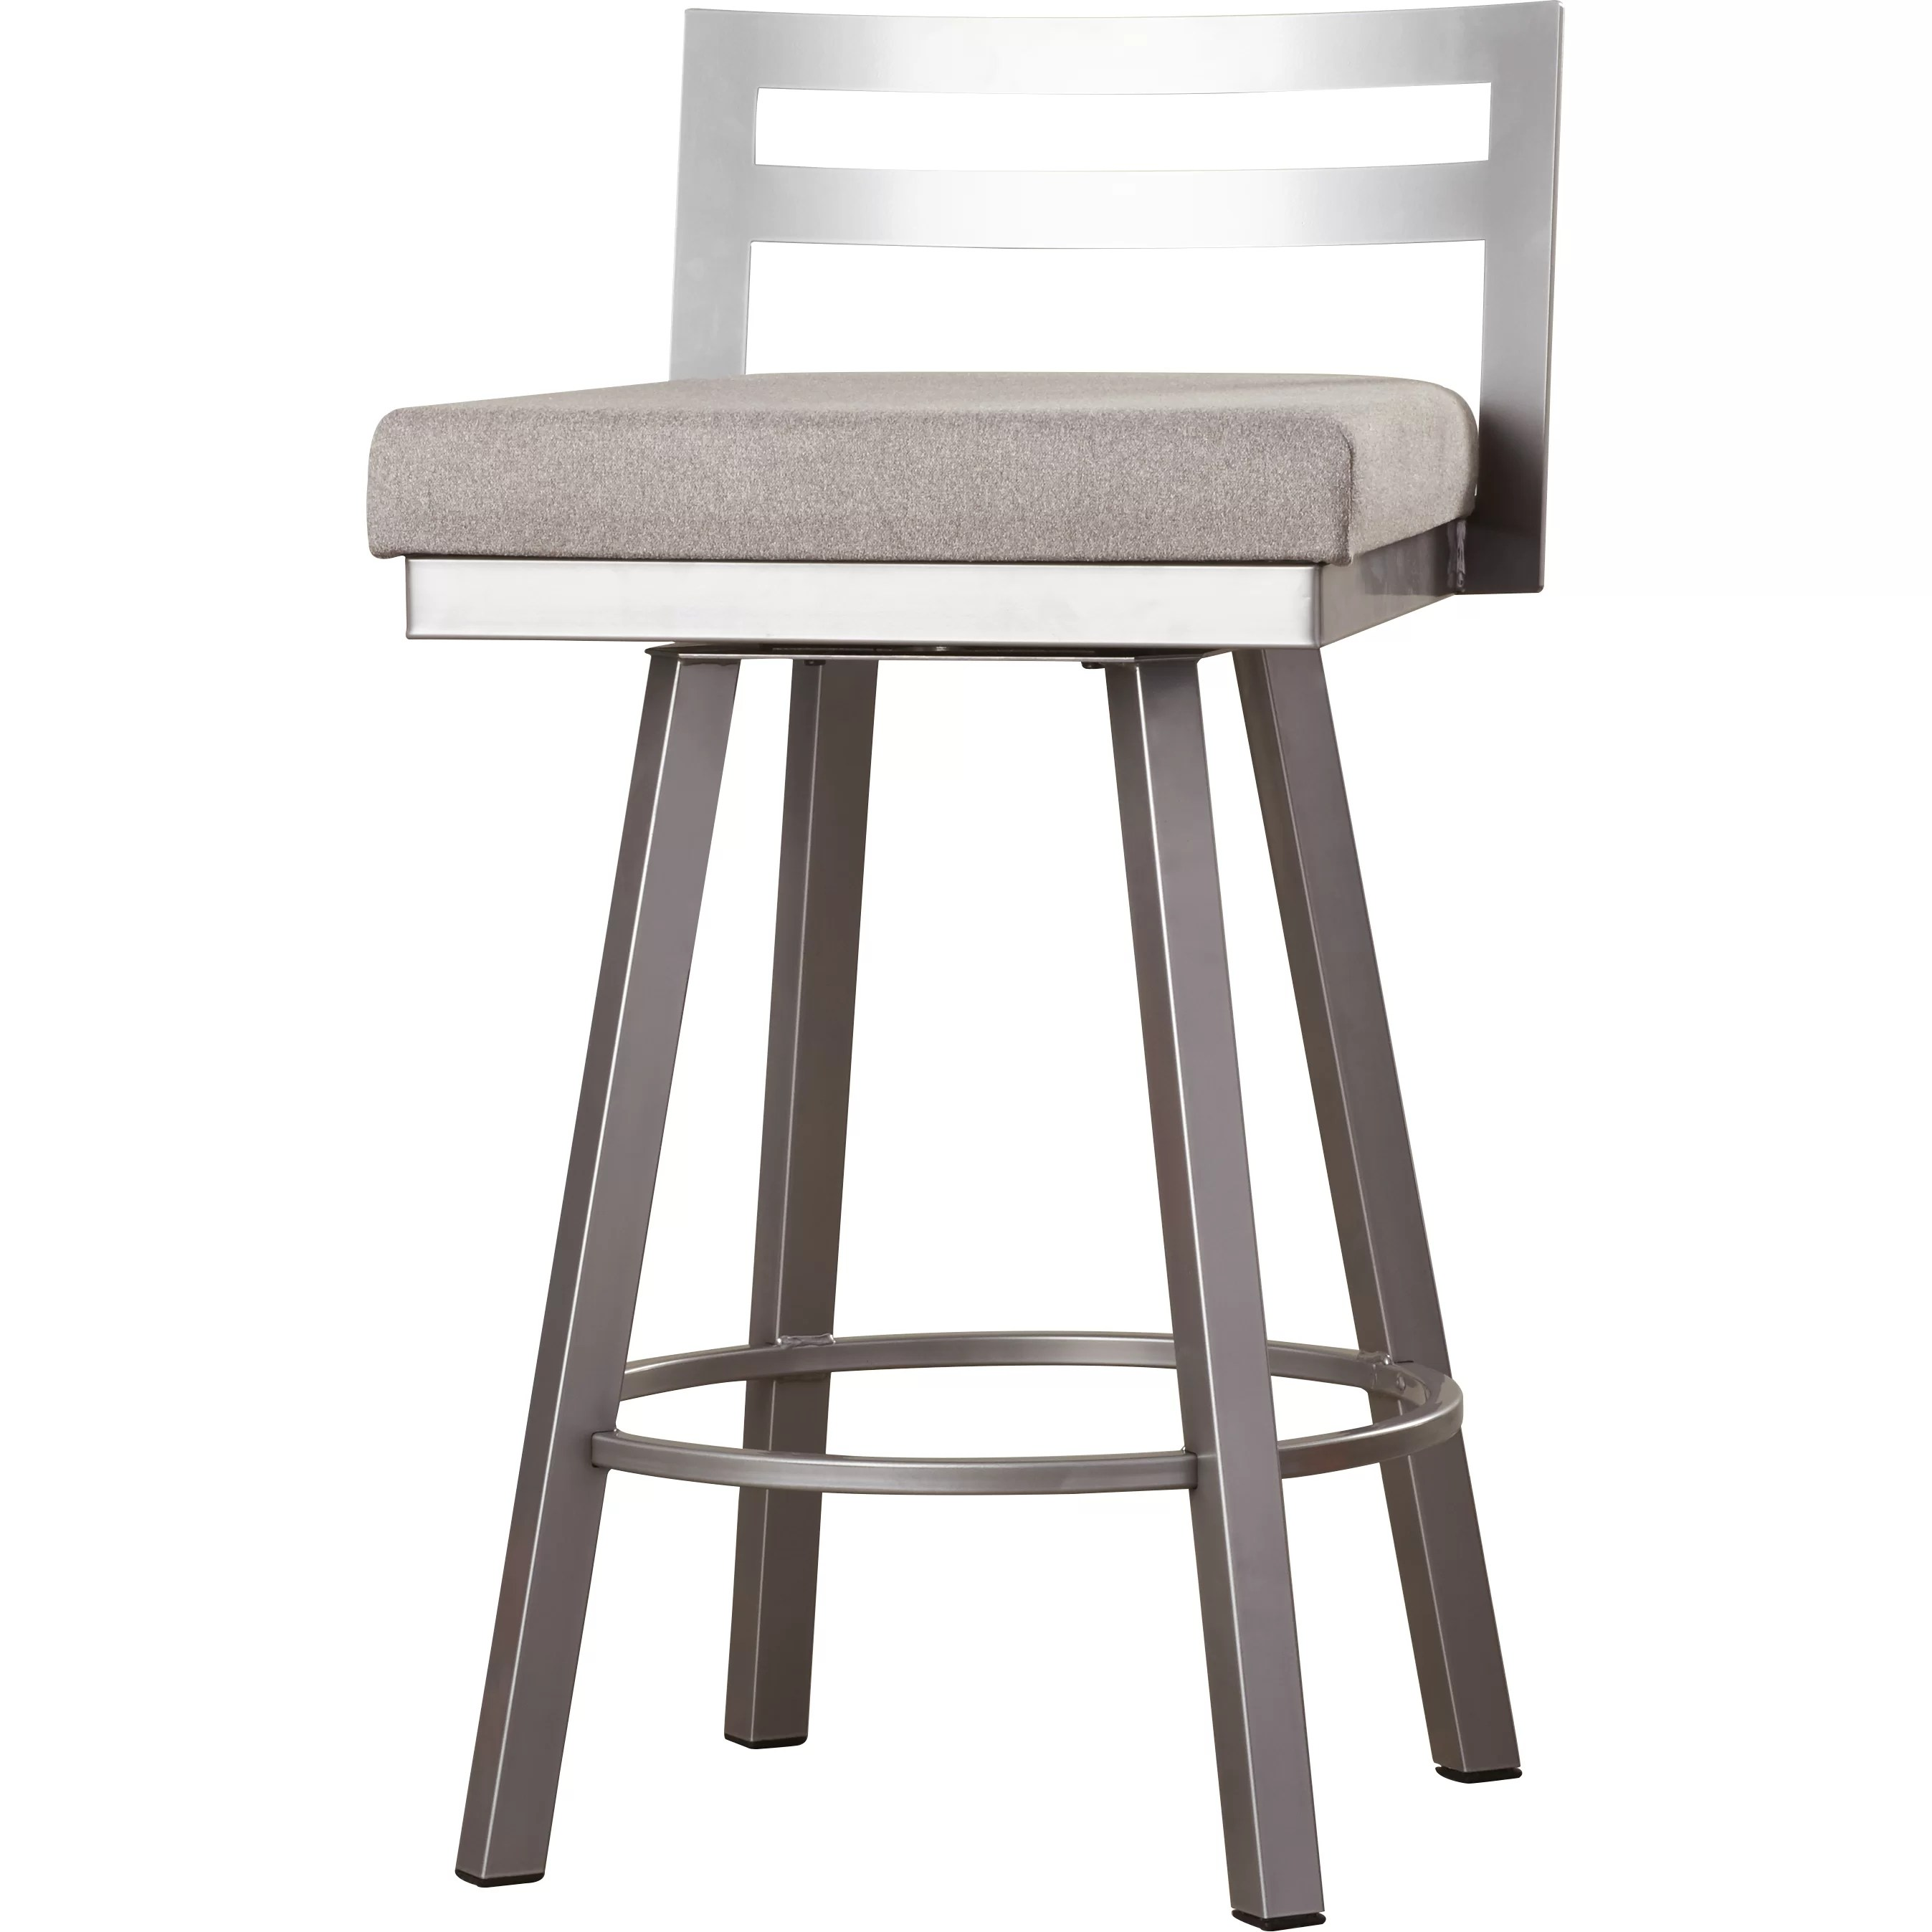 chair bar stool alabama lawn boat brayden studio penton 26 75 quot swivel and reviews